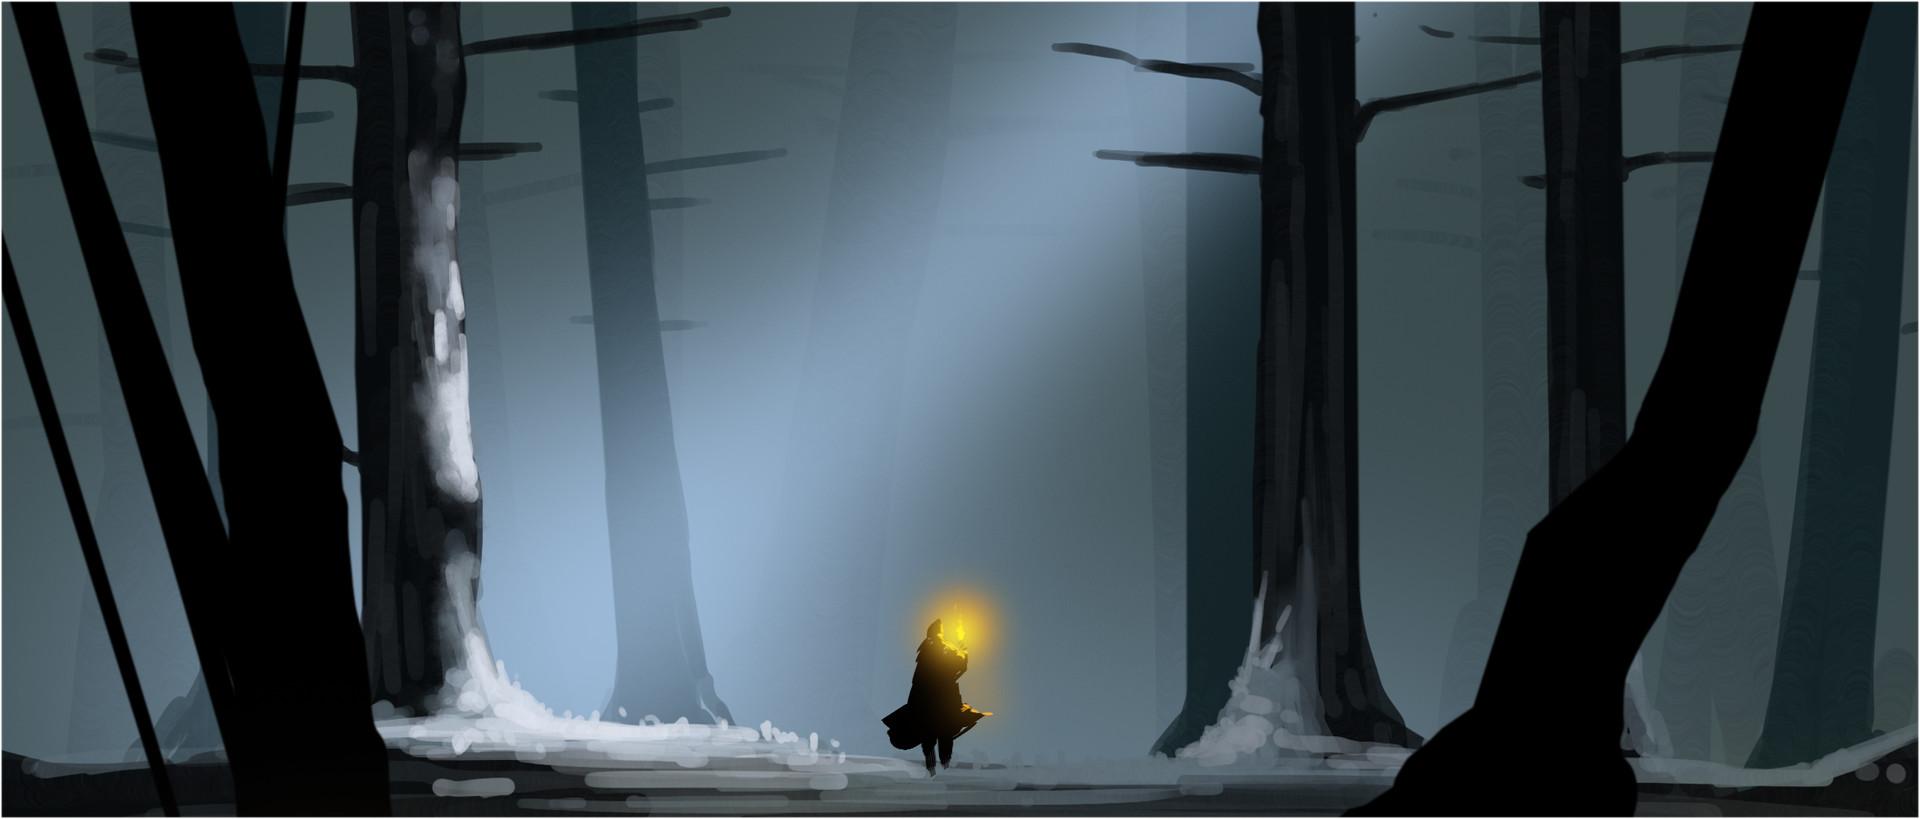 Max schiller mafaka animation bluesky d v01